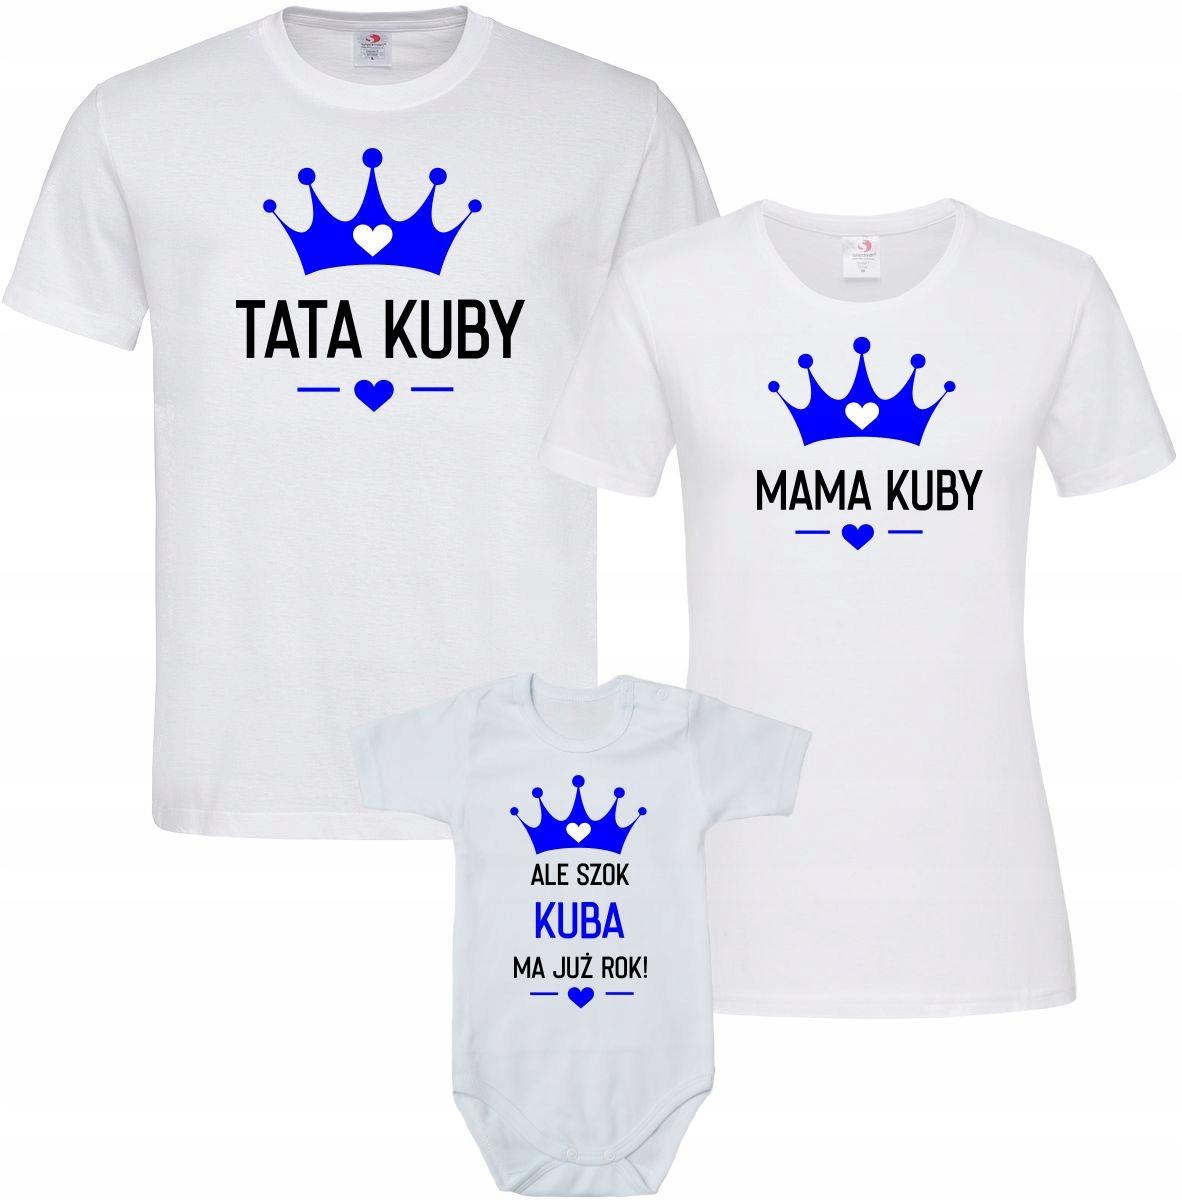 Koszulki Na Roczek Dla Rodziny Mama Tata Syn Body 9446199154 Allegro Pl